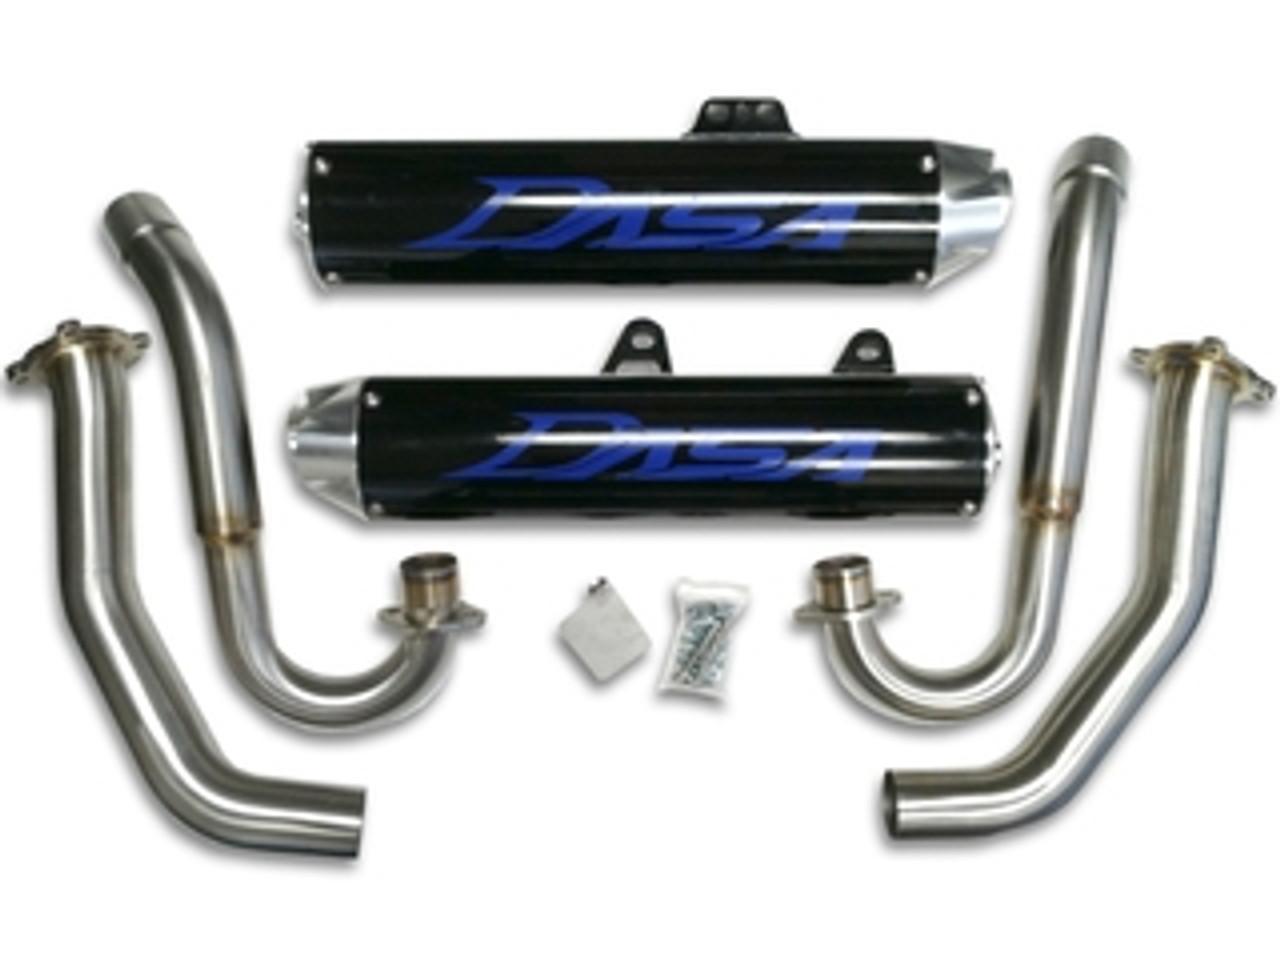 06 14 raptor 700 dasa dual exhaust pipe